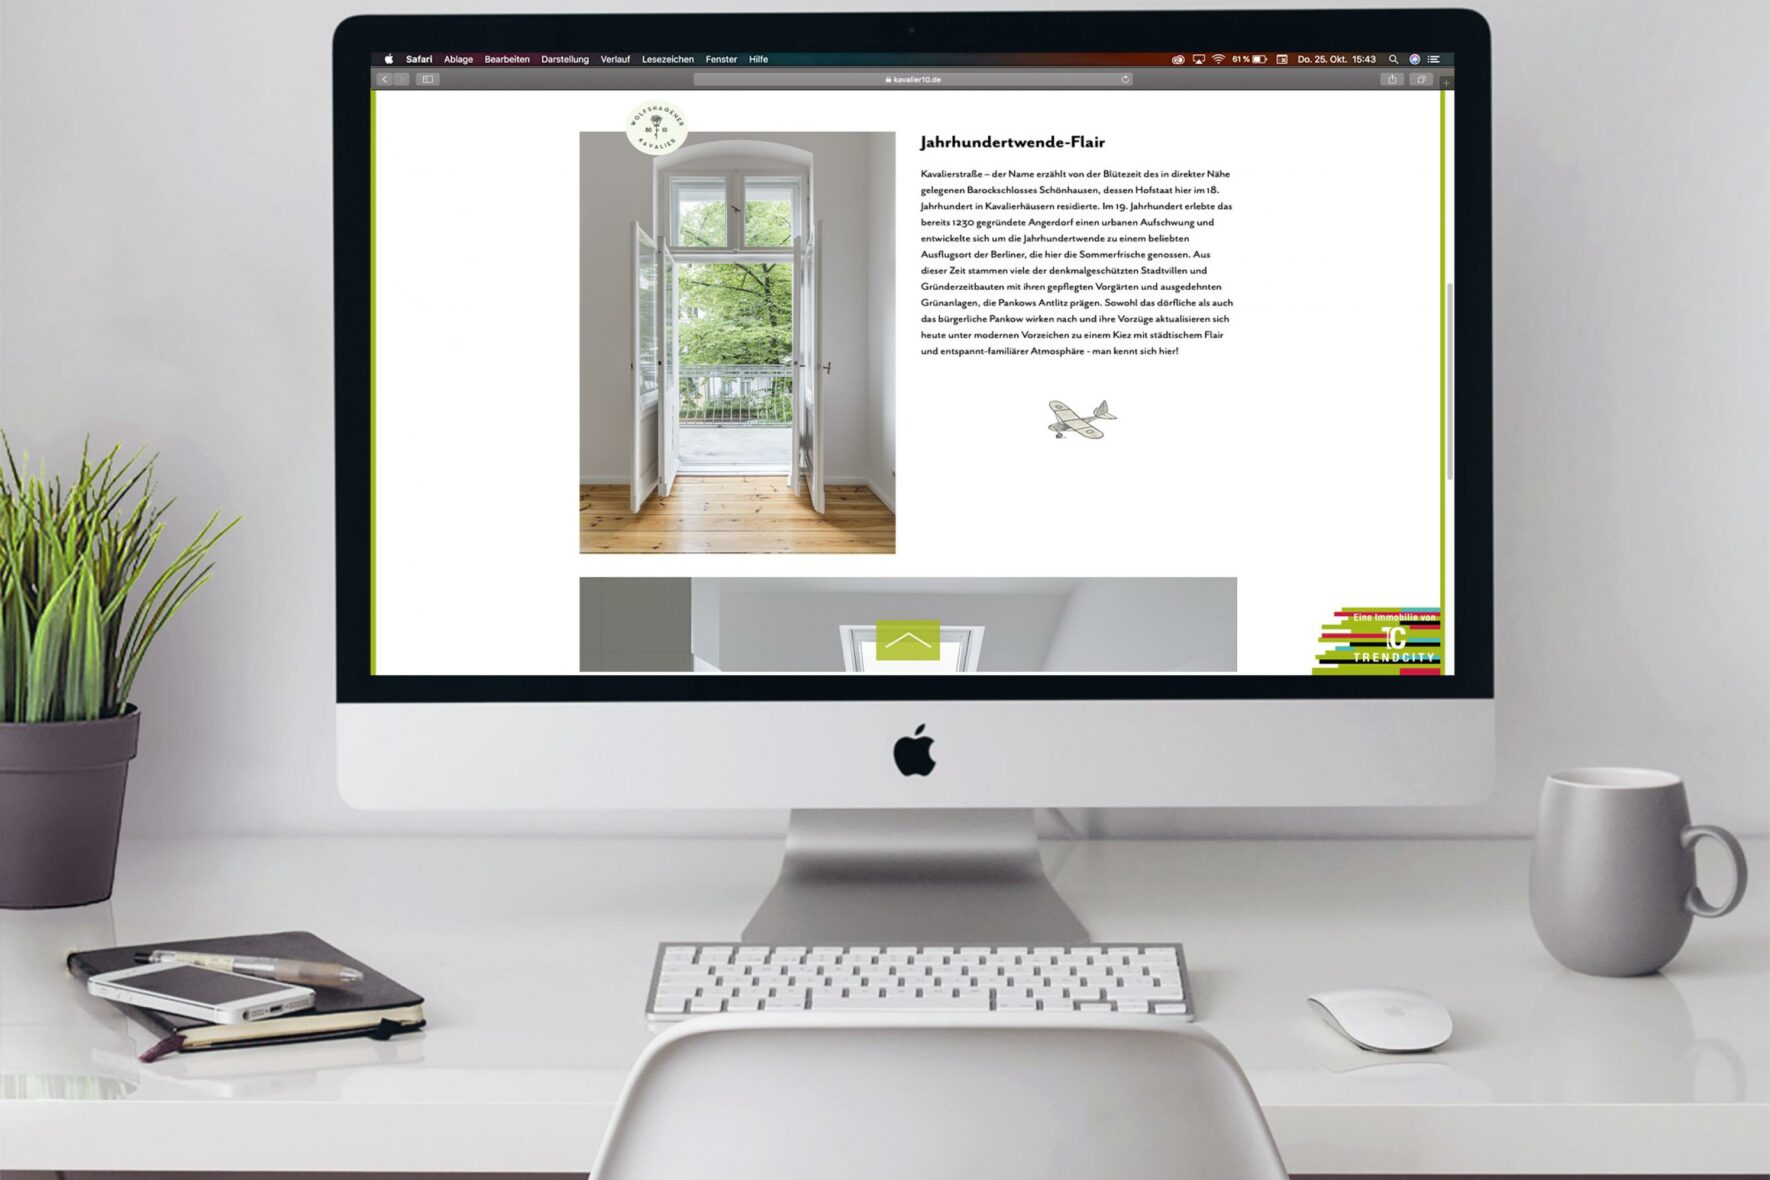 Webiste-Objekte-Branding-Trendcity-Immobilien-Kavalierstrasse-Webdesign-Corporat-Design-4